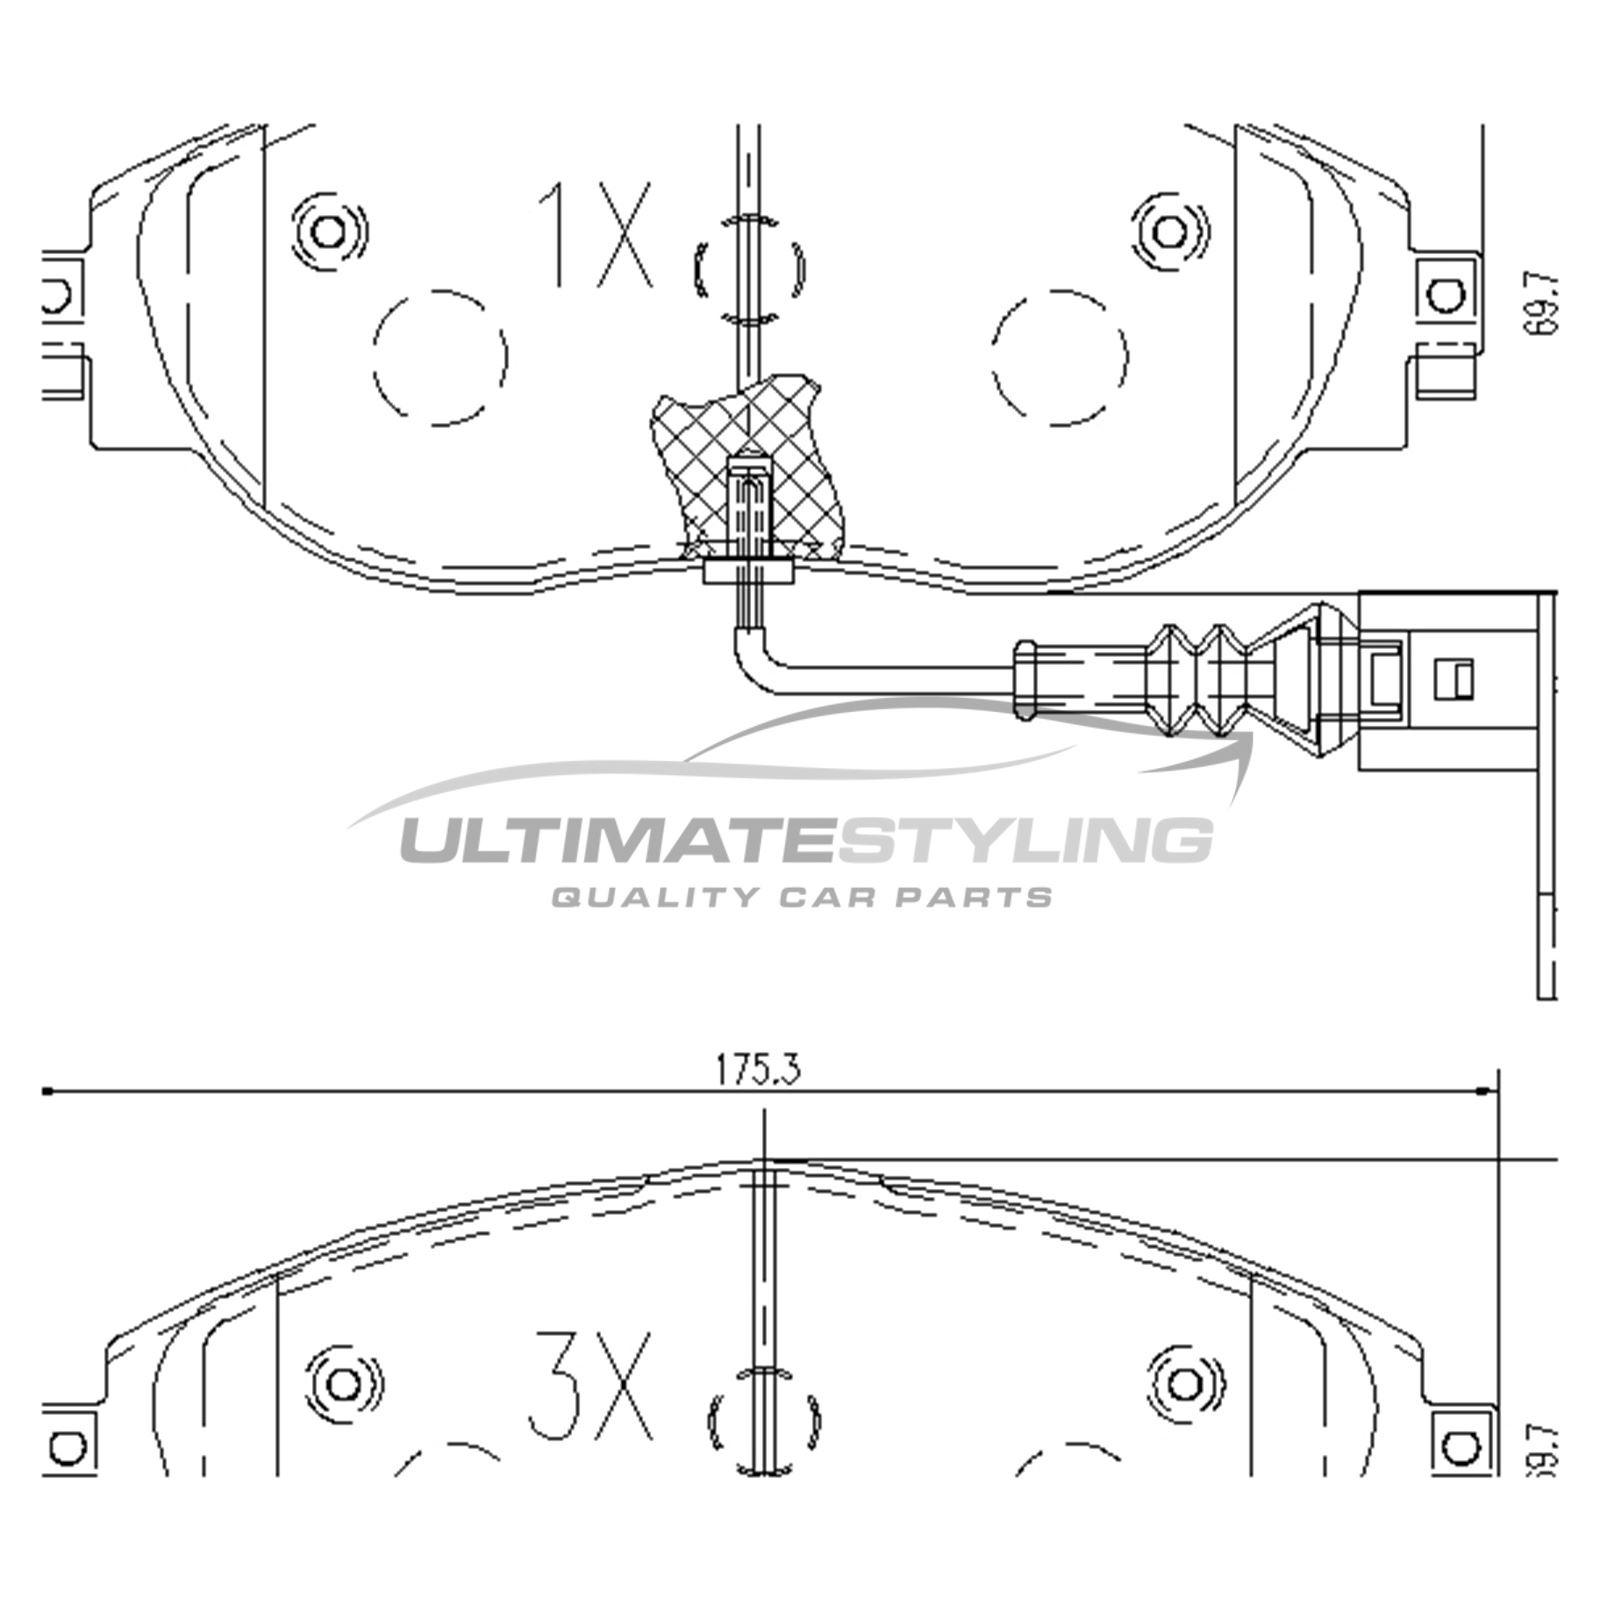 skoda kodiaq ns7 suv 2016-> 1.4 2.0 front brake pads kit w175-h70 ...  ebay